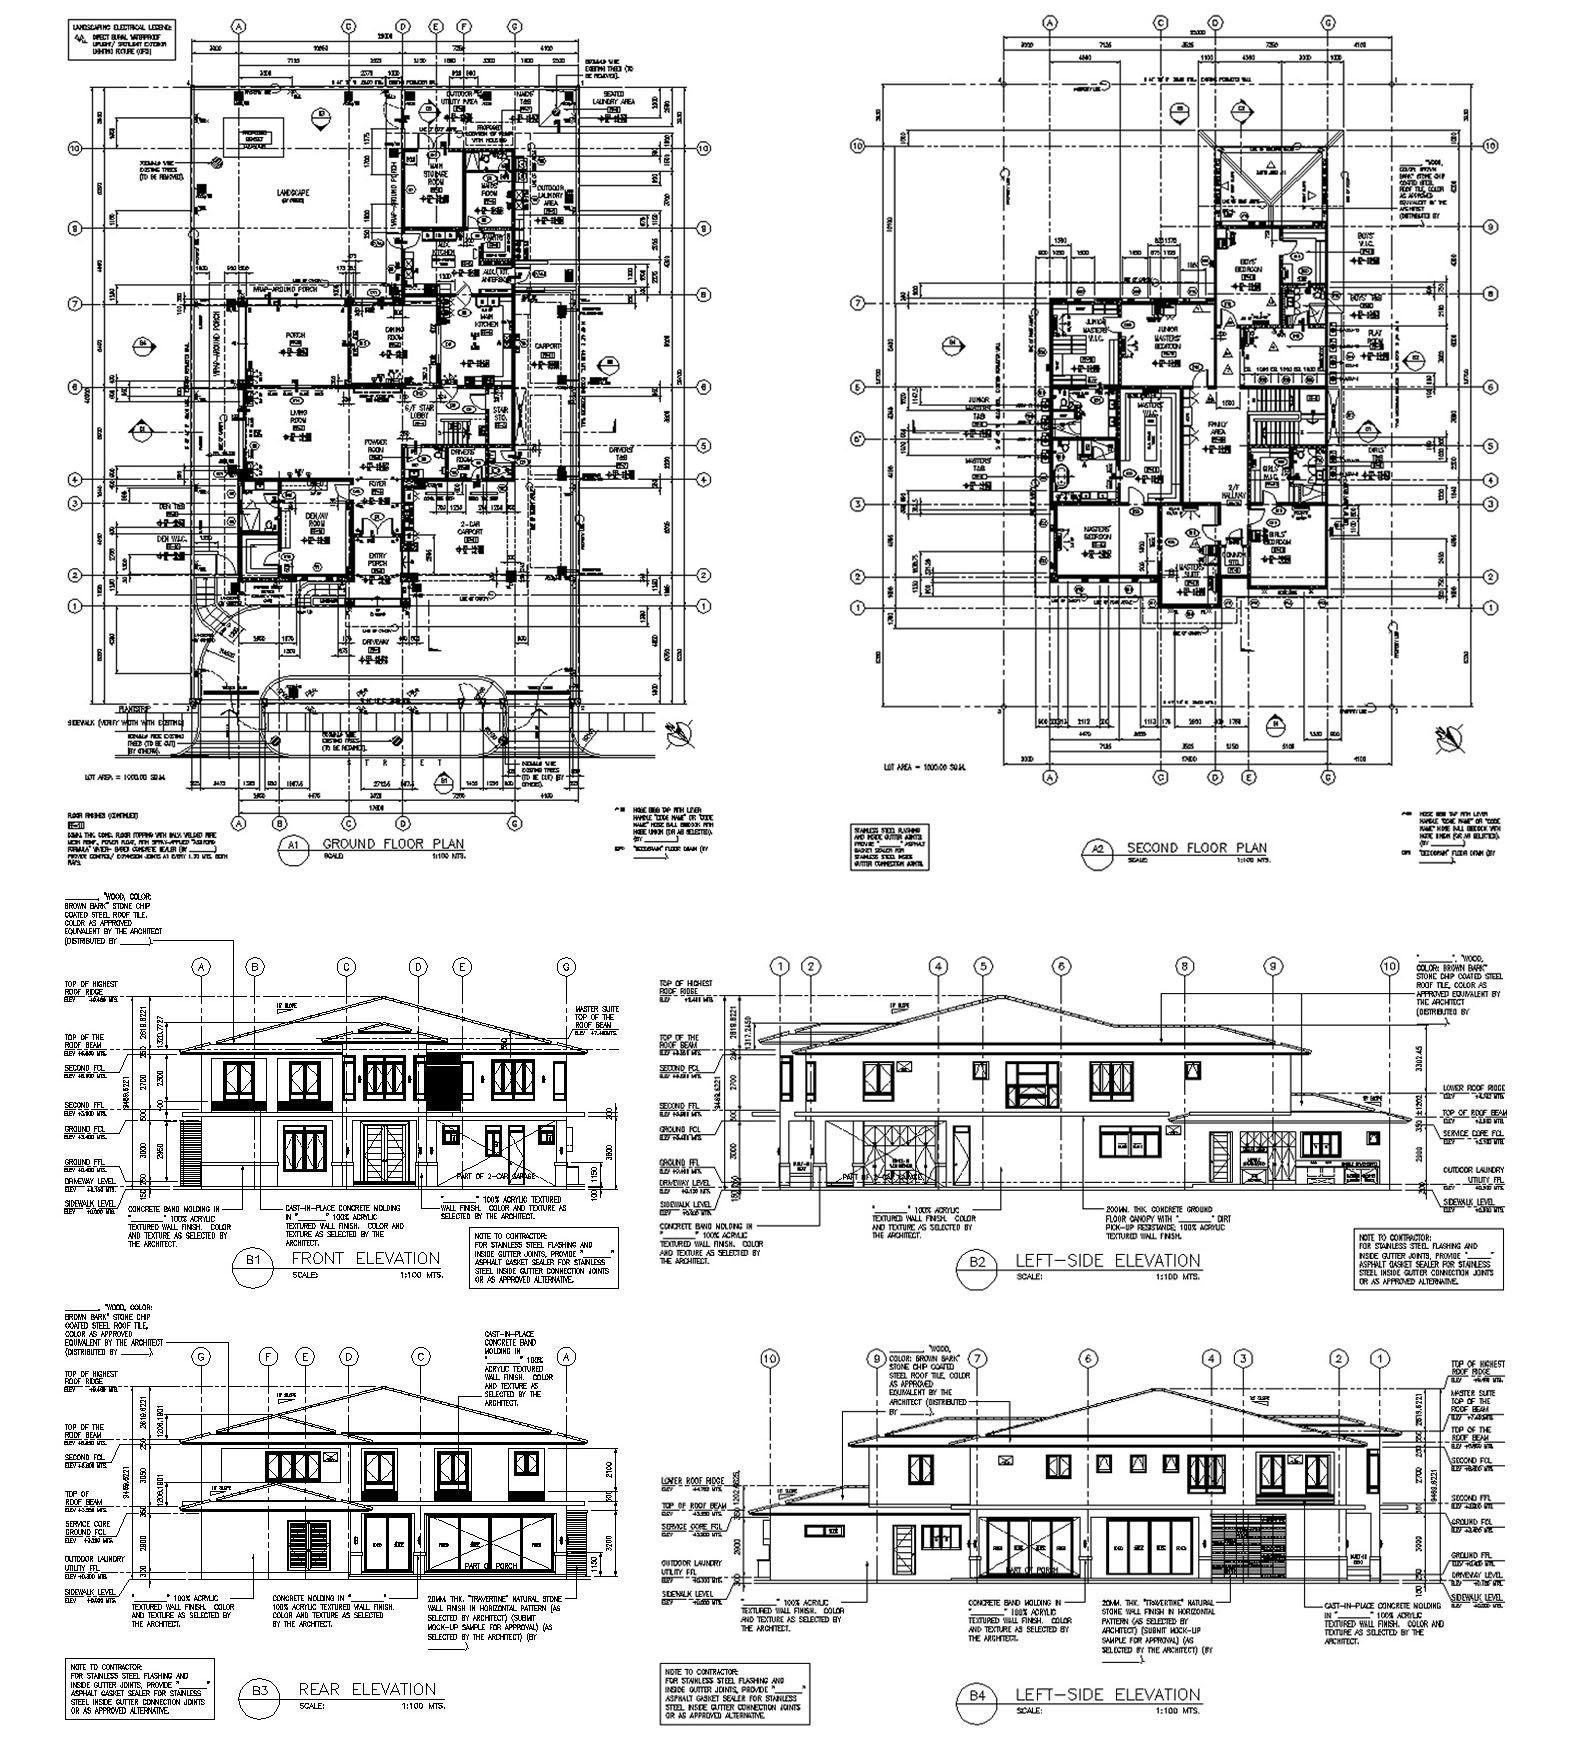 Detailed 2 Storey Residential Unit Floor Plan With Elevations Residential House Floor Plans Residential